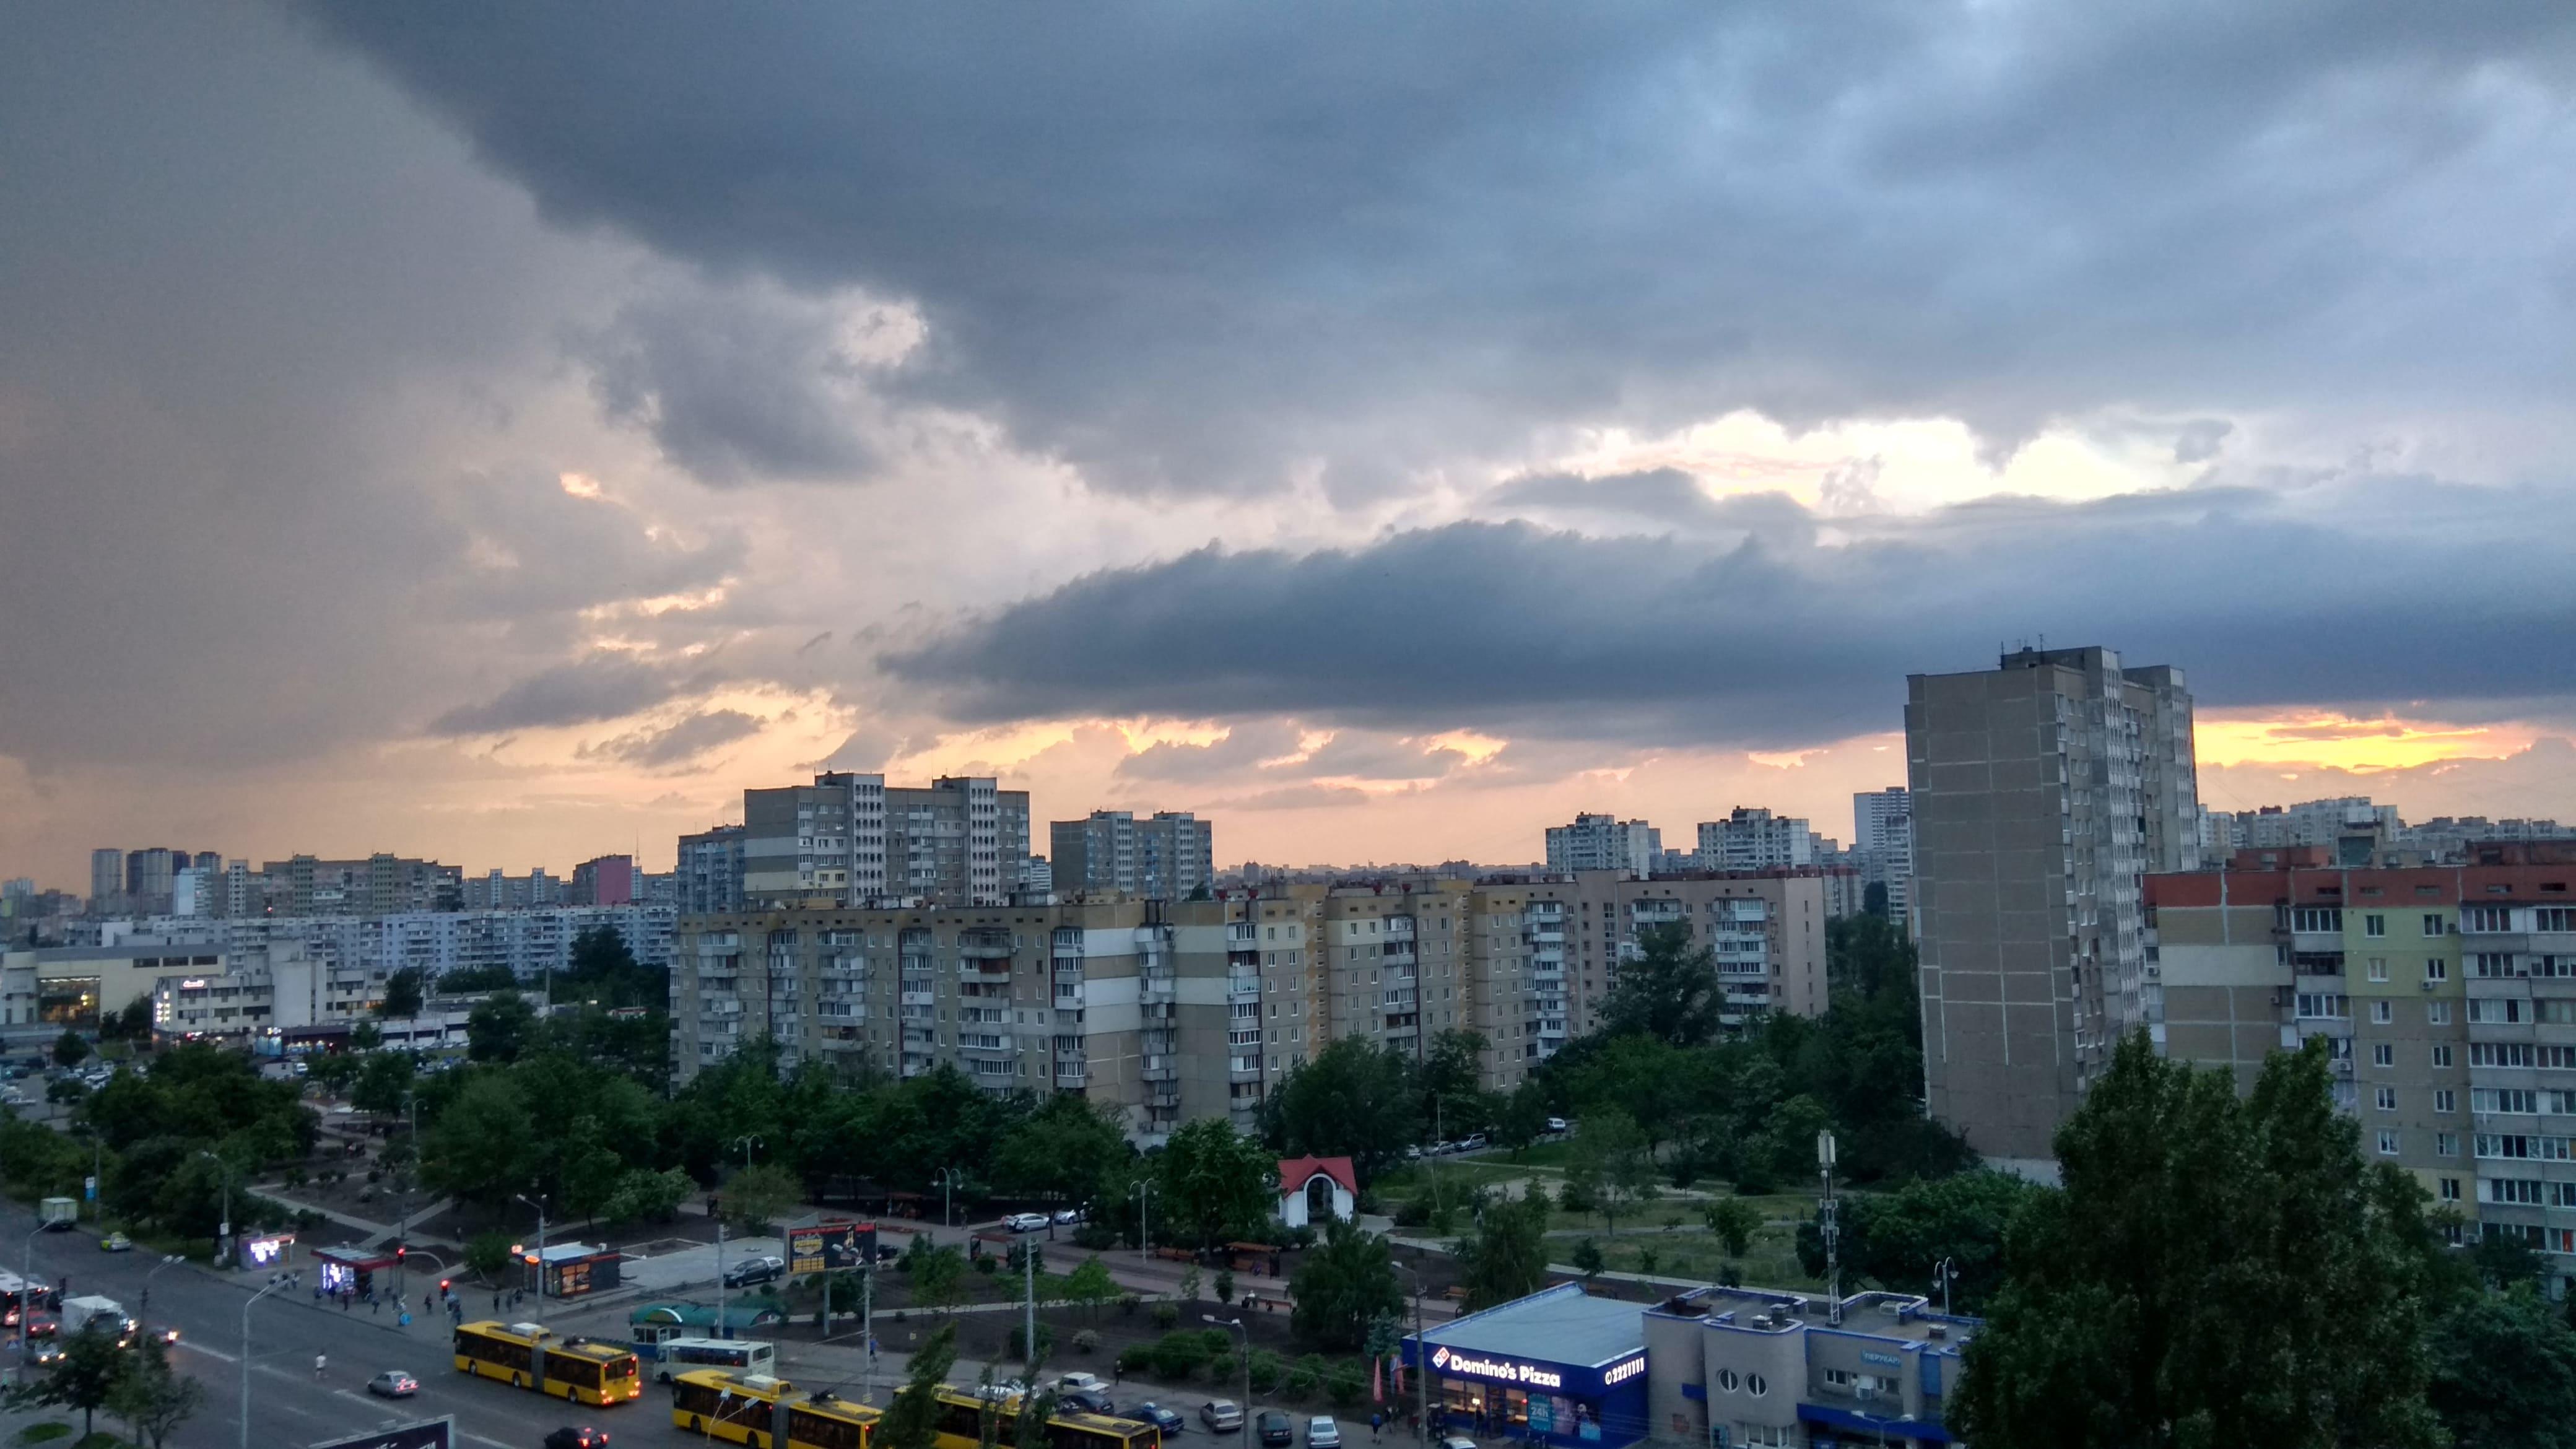 HDoboi.Kiev.ua - Киев, район троещина, City wallpapers HD download